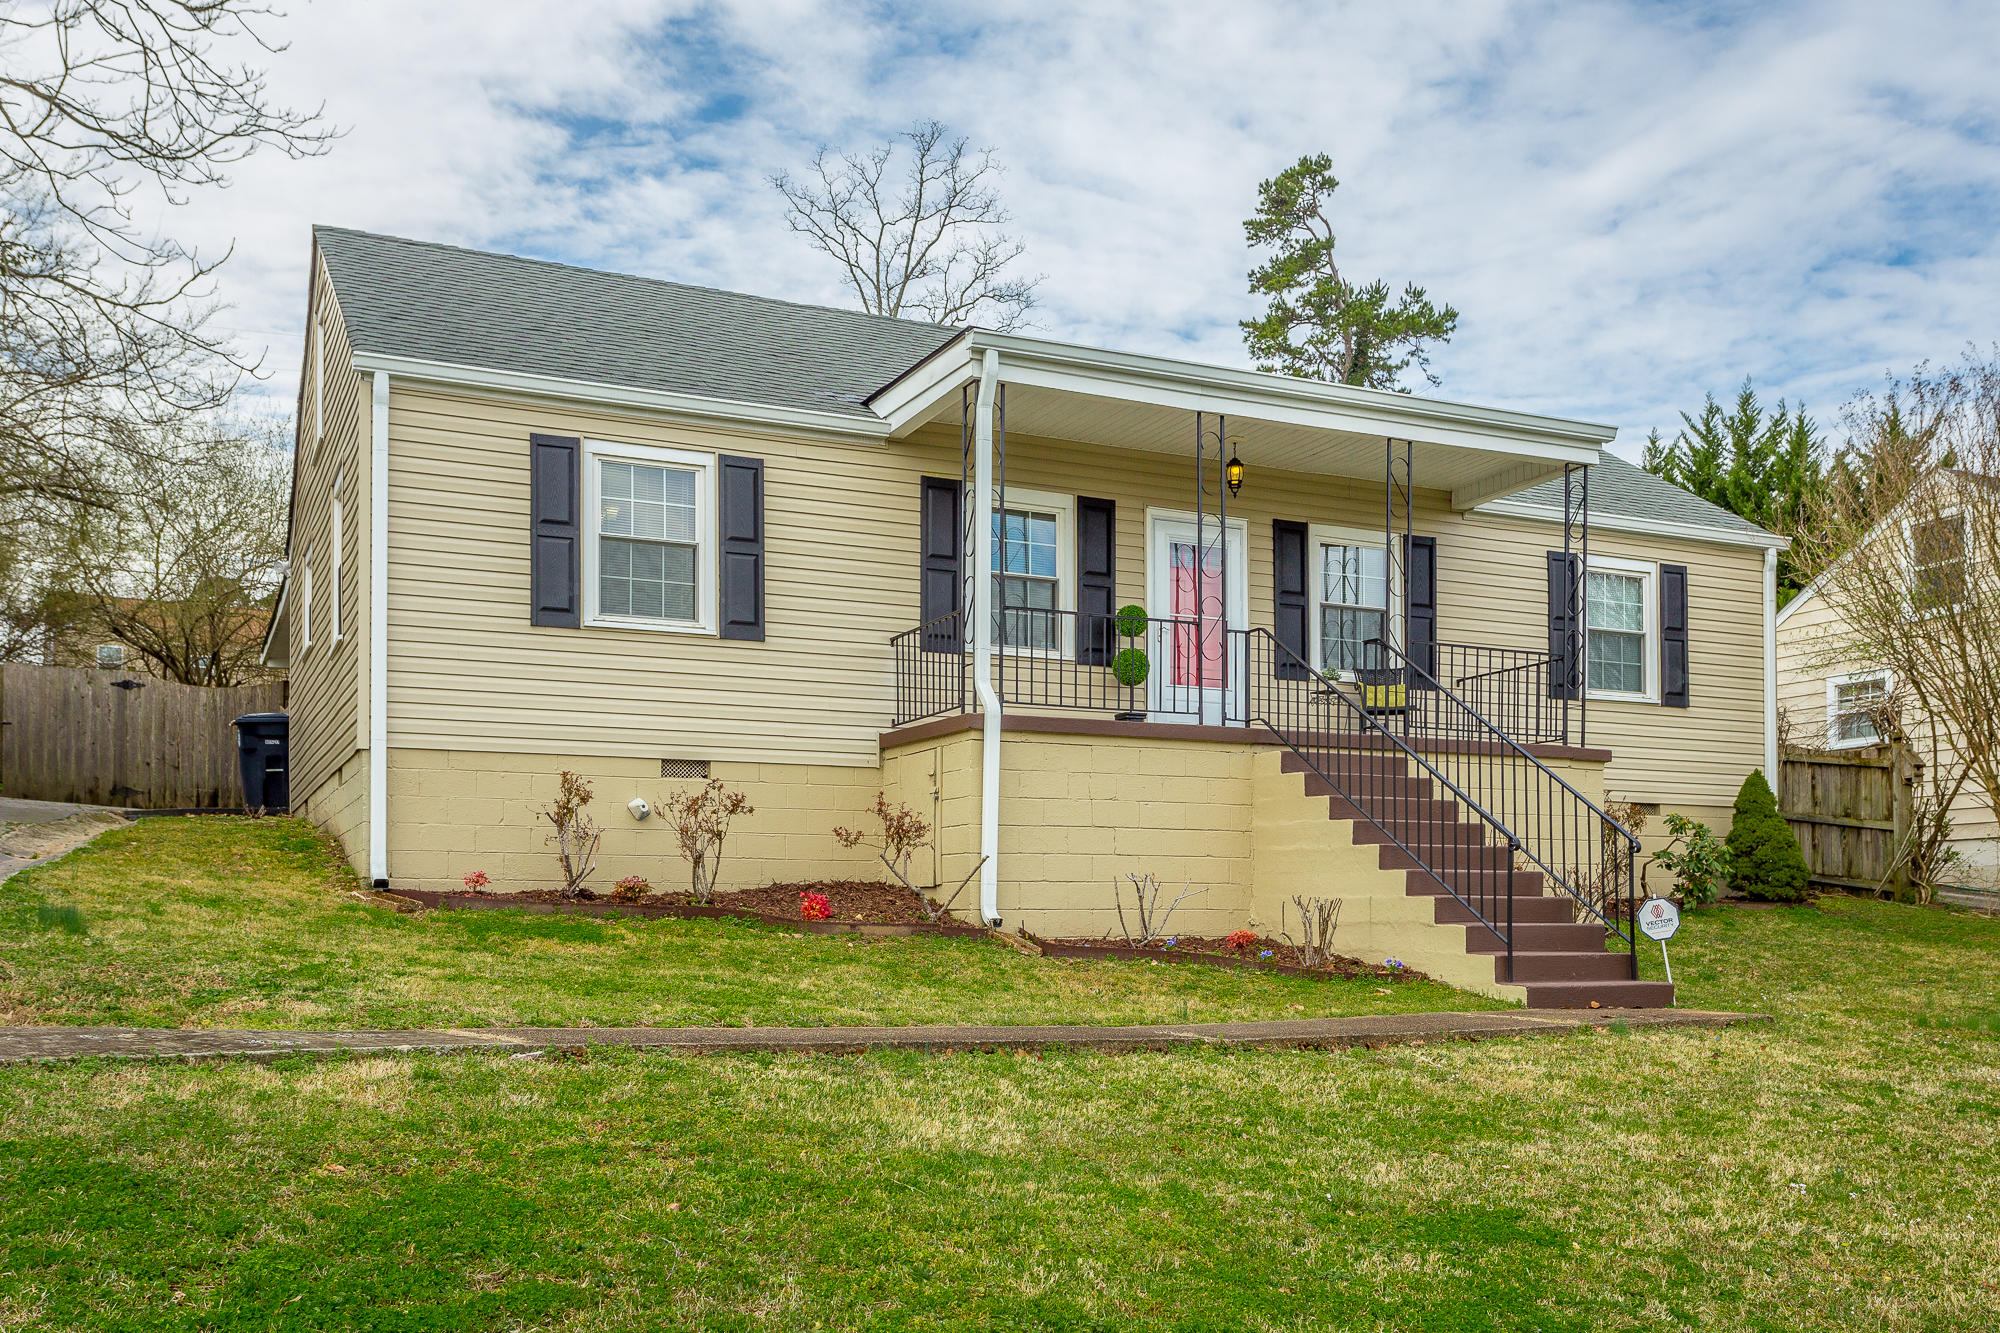 1019 Hibbler Cir, Chattanooga, TN 37412